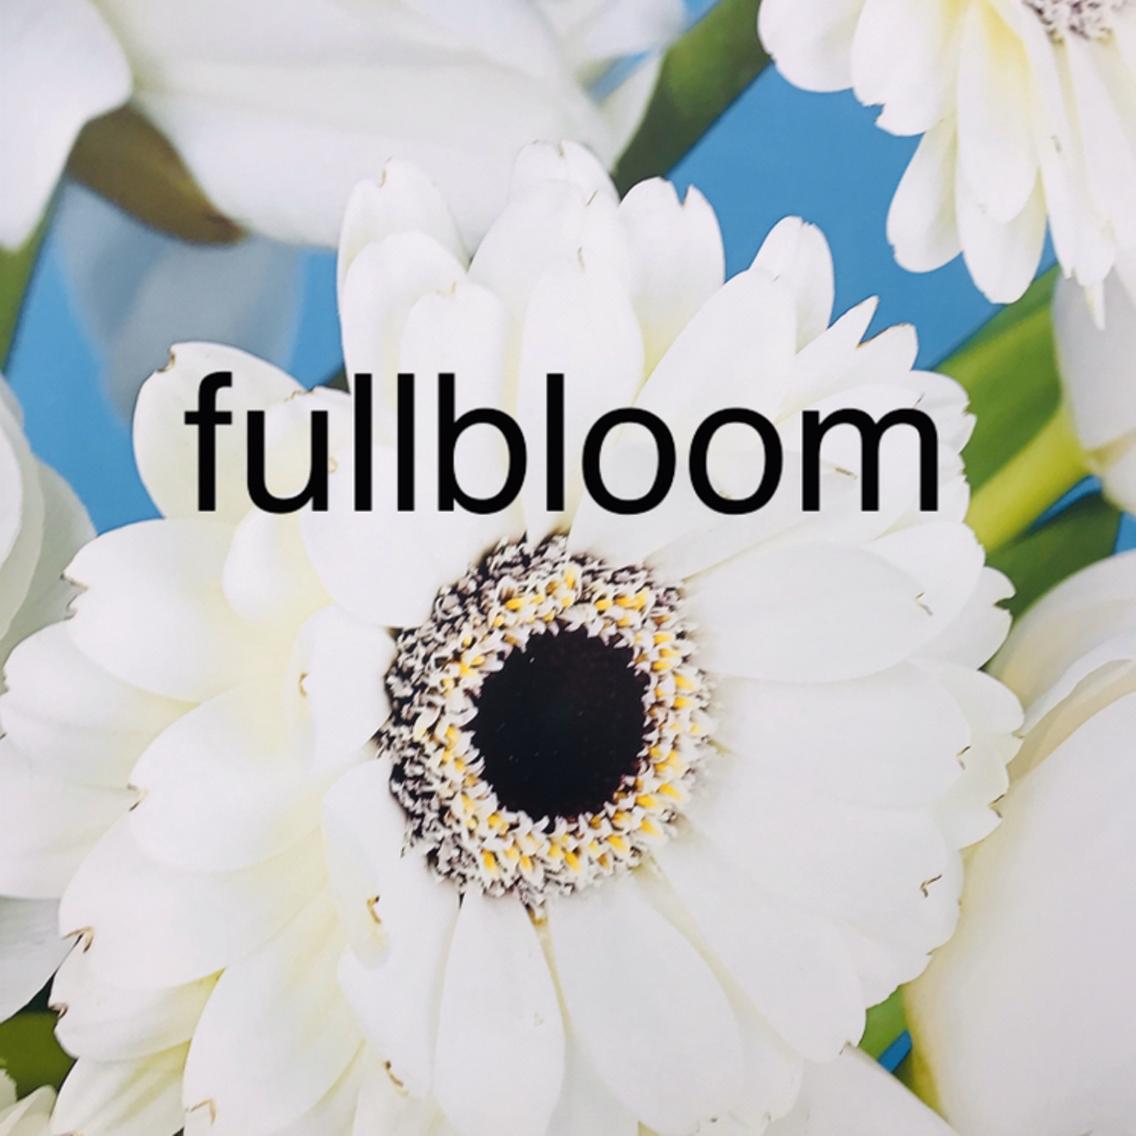 fullbloomeyelash所属・fullbloom Ajiroの掲載